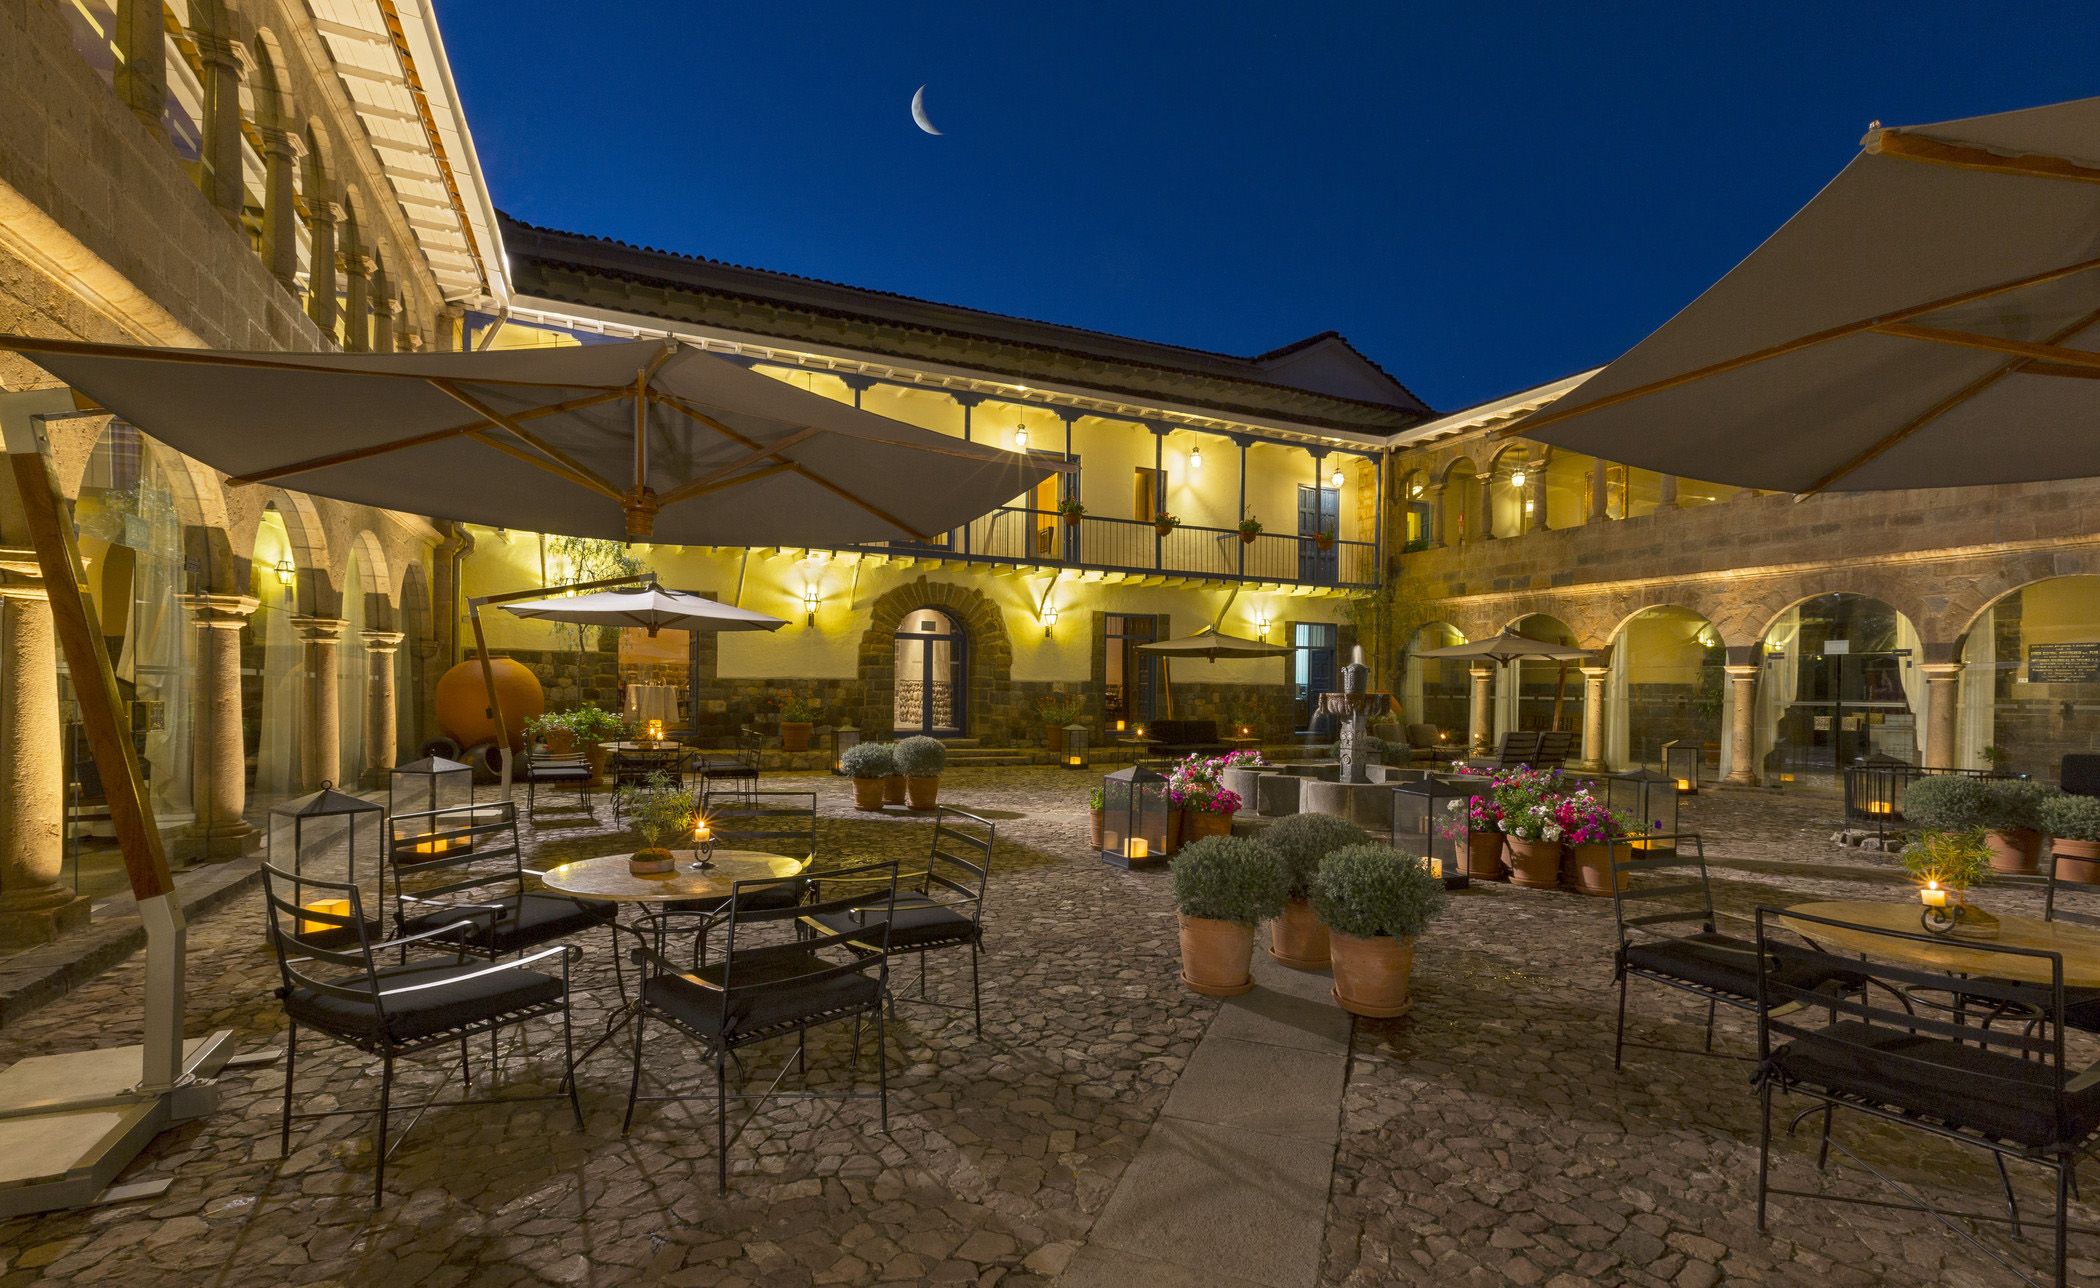 Bar rumi at the palacio del inka luxury collection hotel for Luxury hotel collection